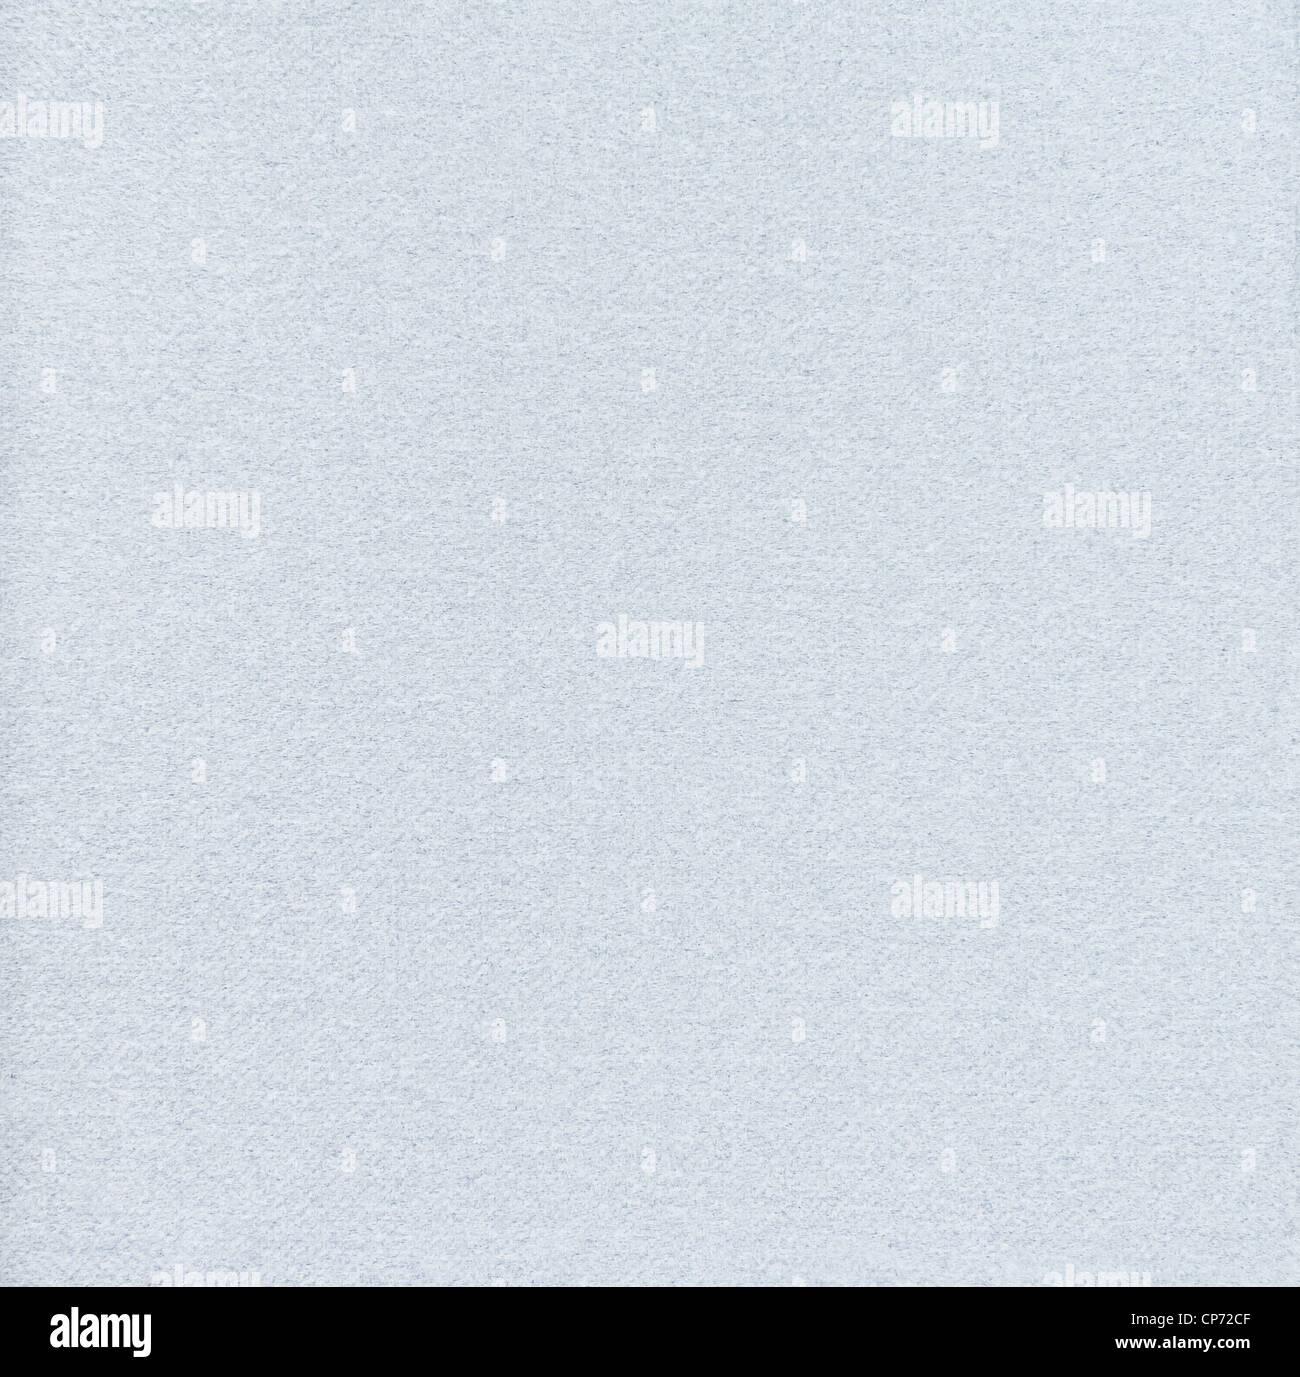 Napkin Texture - Stock Image